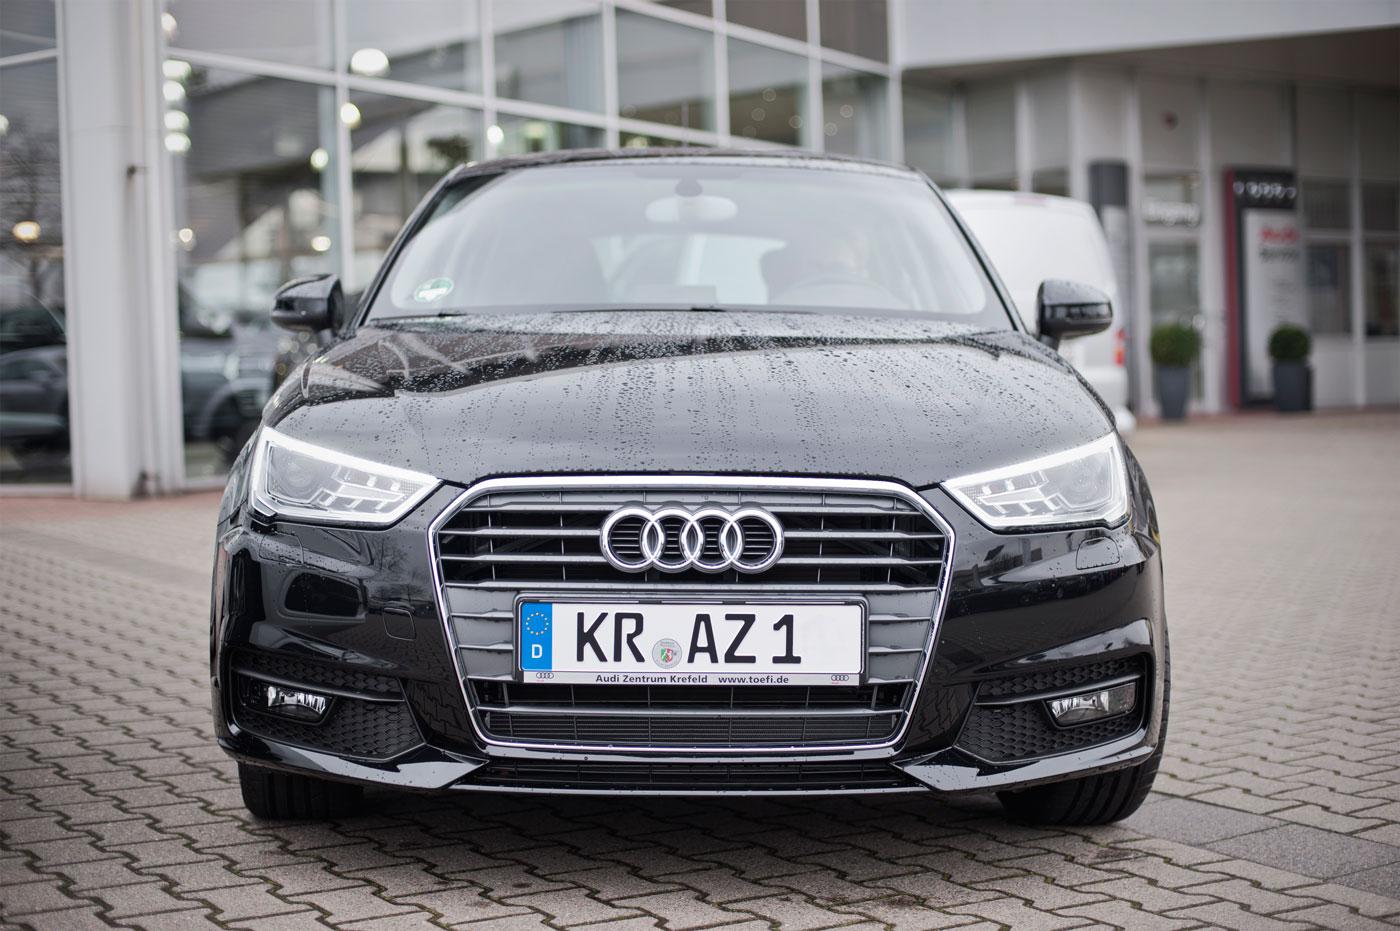 Audi Zentrum Krefeld - Audi select: Mehr Auto geht nicht!